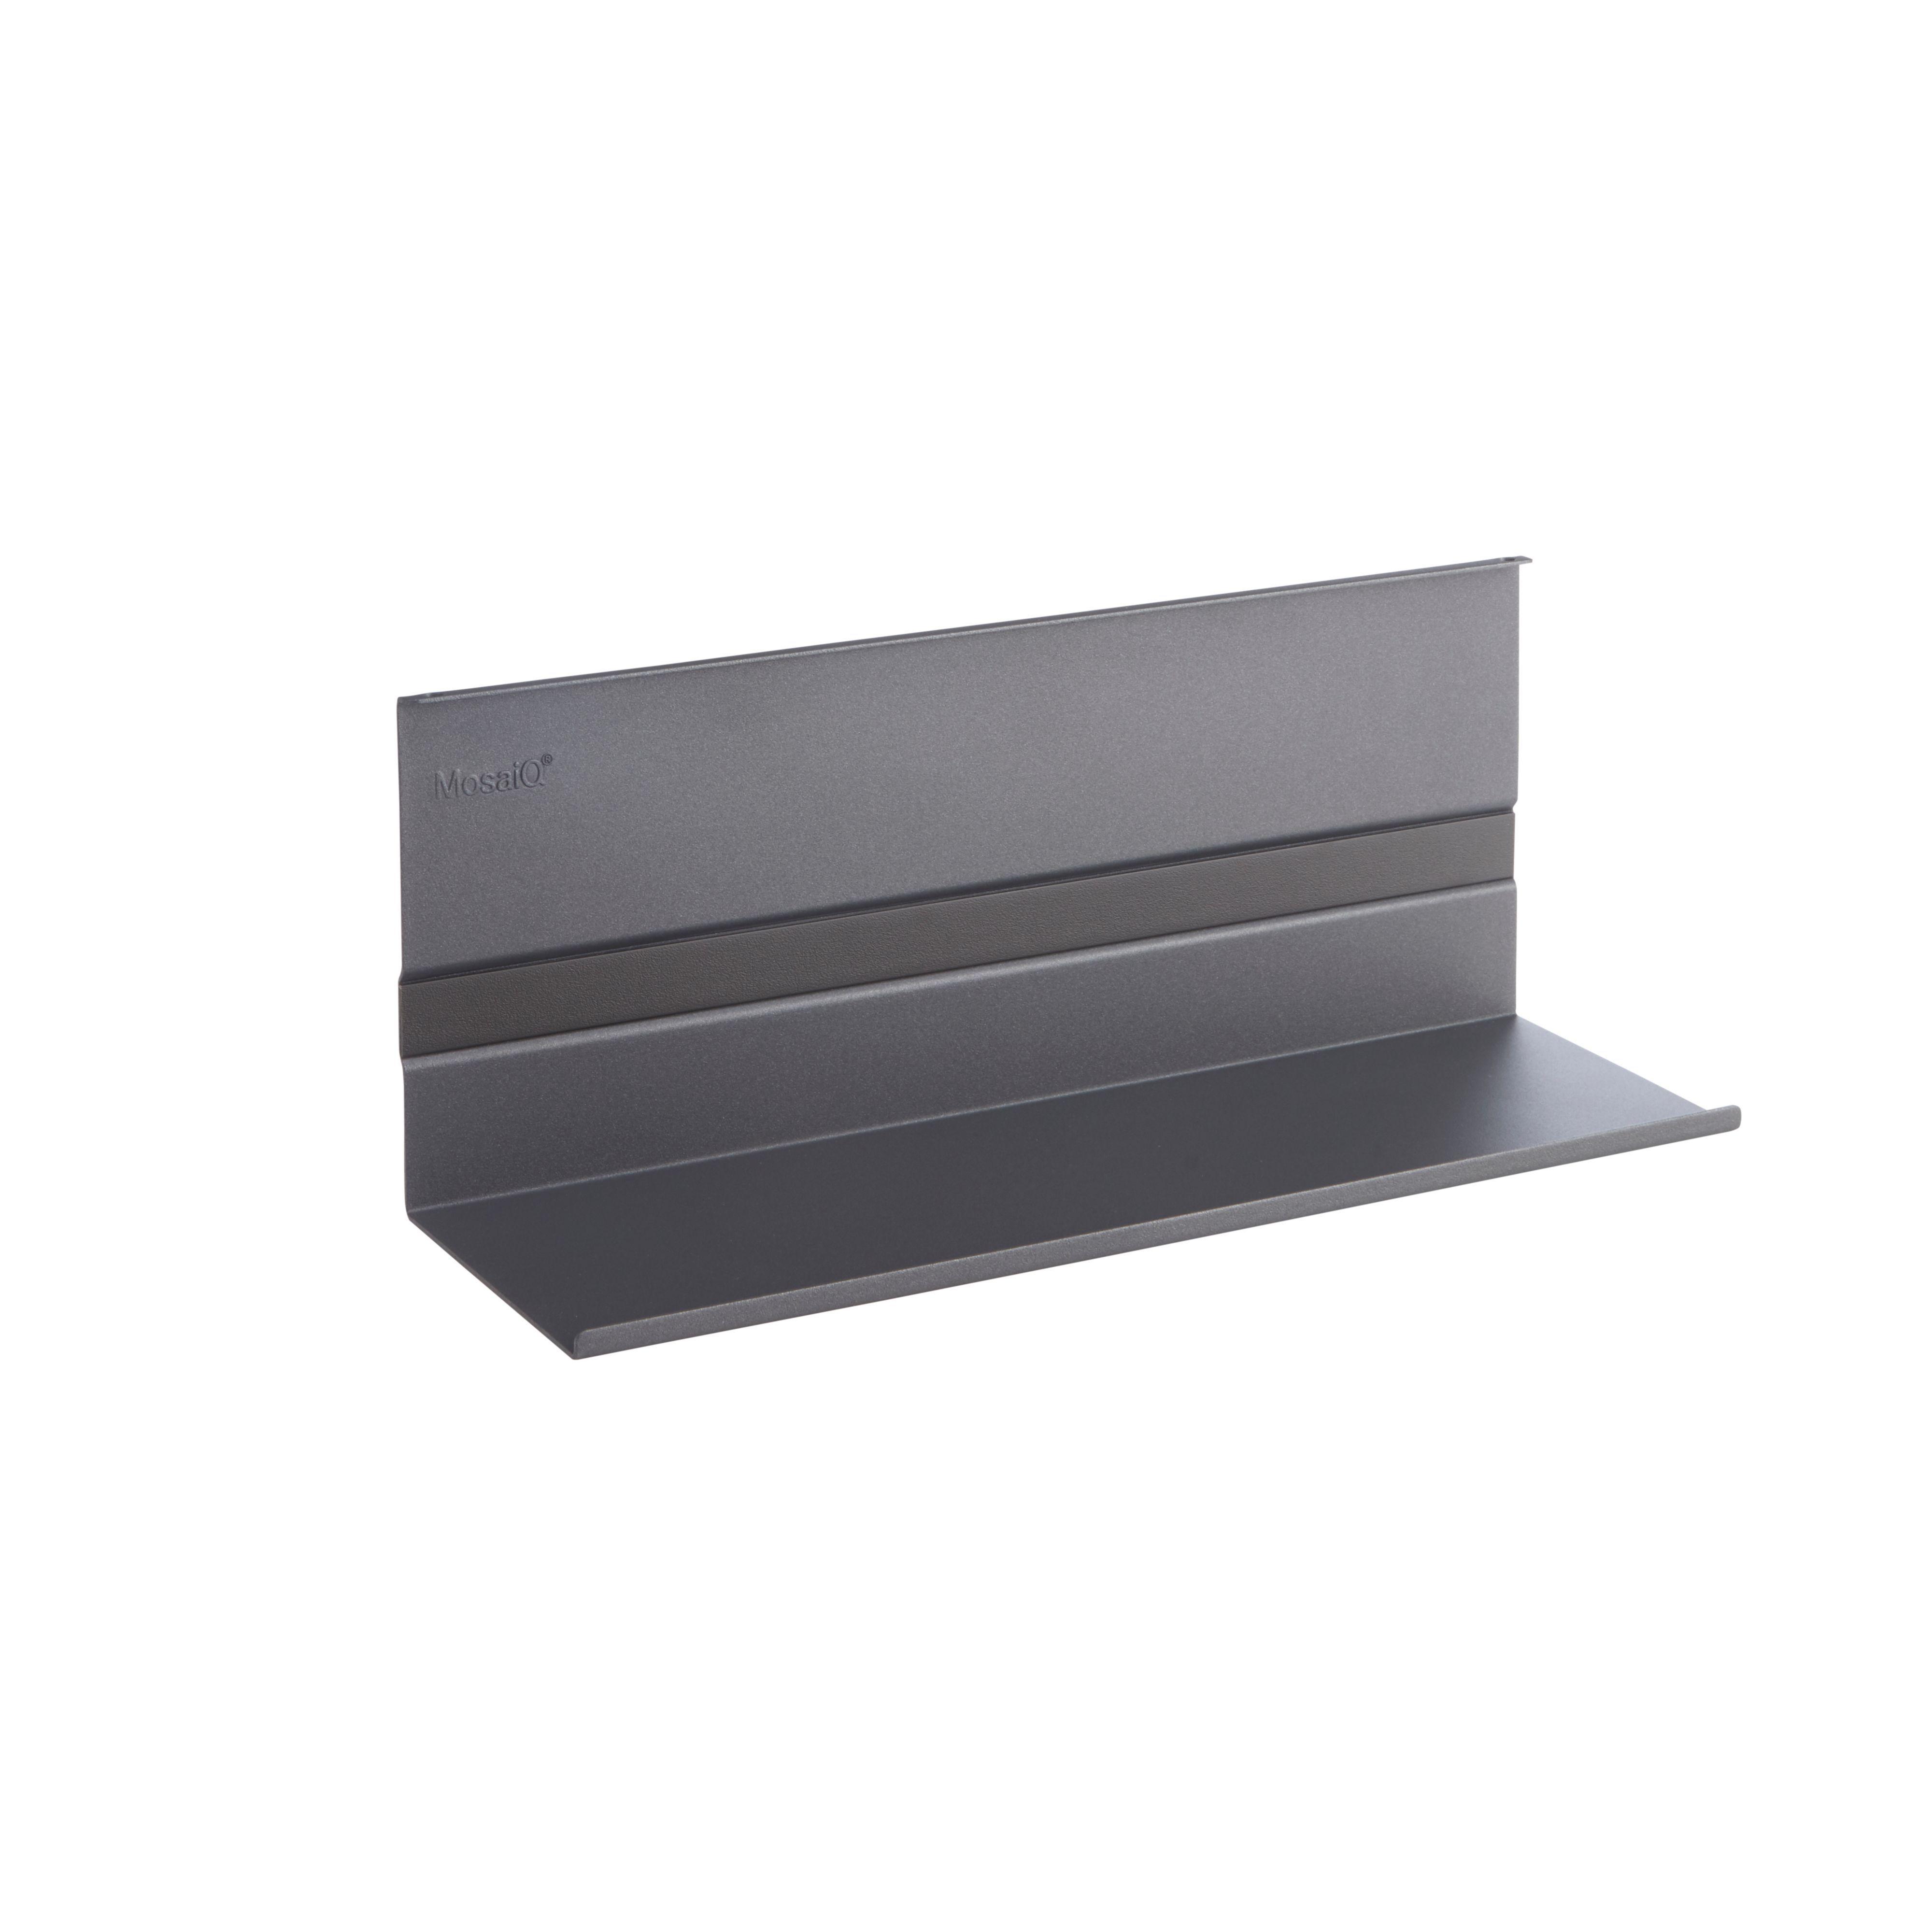 Kesseböhmer Linero Mosaiq Brushed Silver Effect Shelf (h)140mm